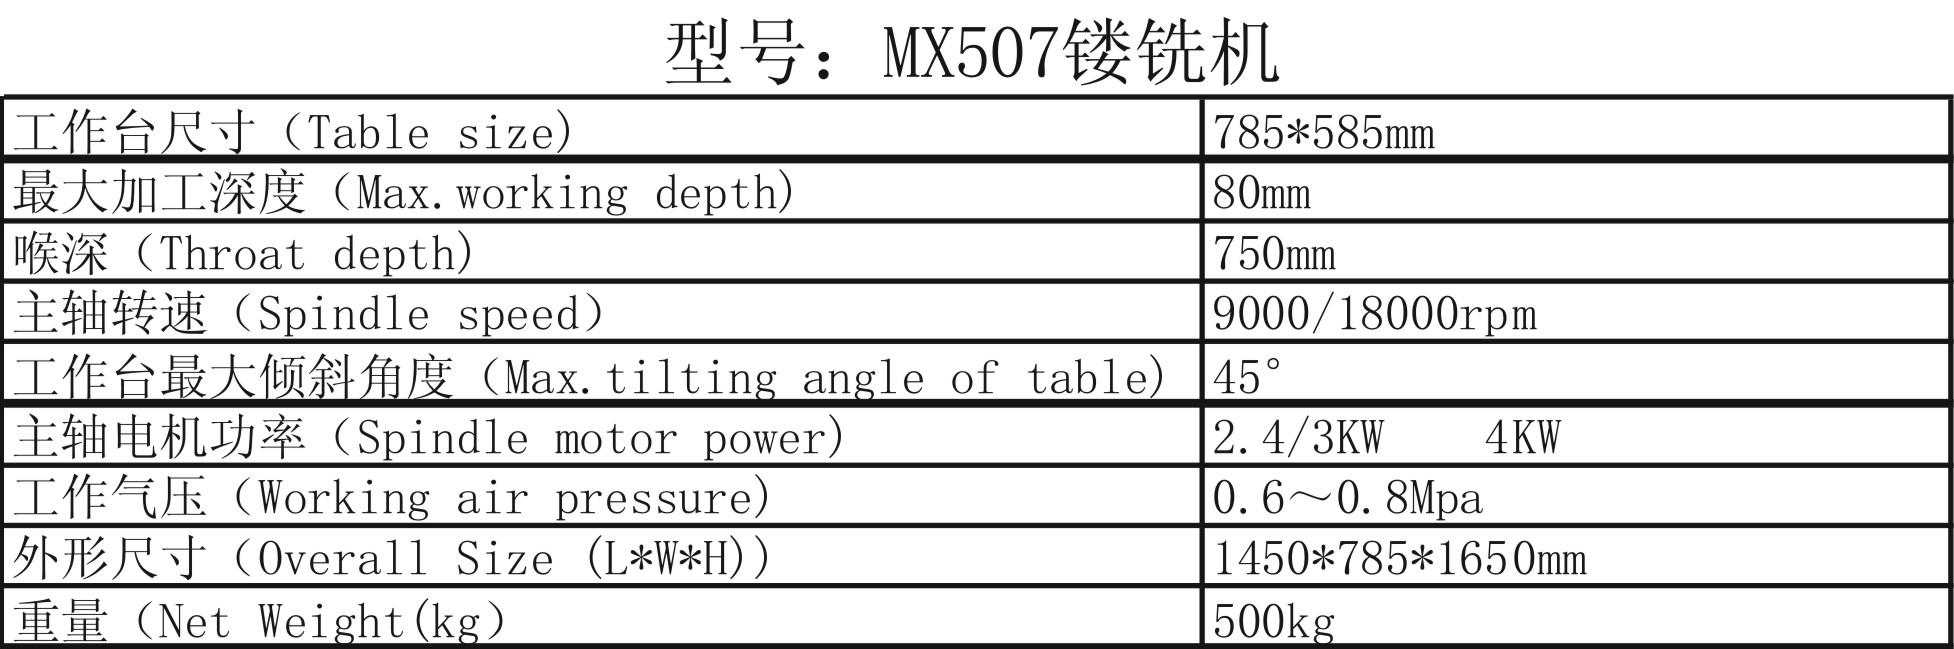 MX507气动镂铣机